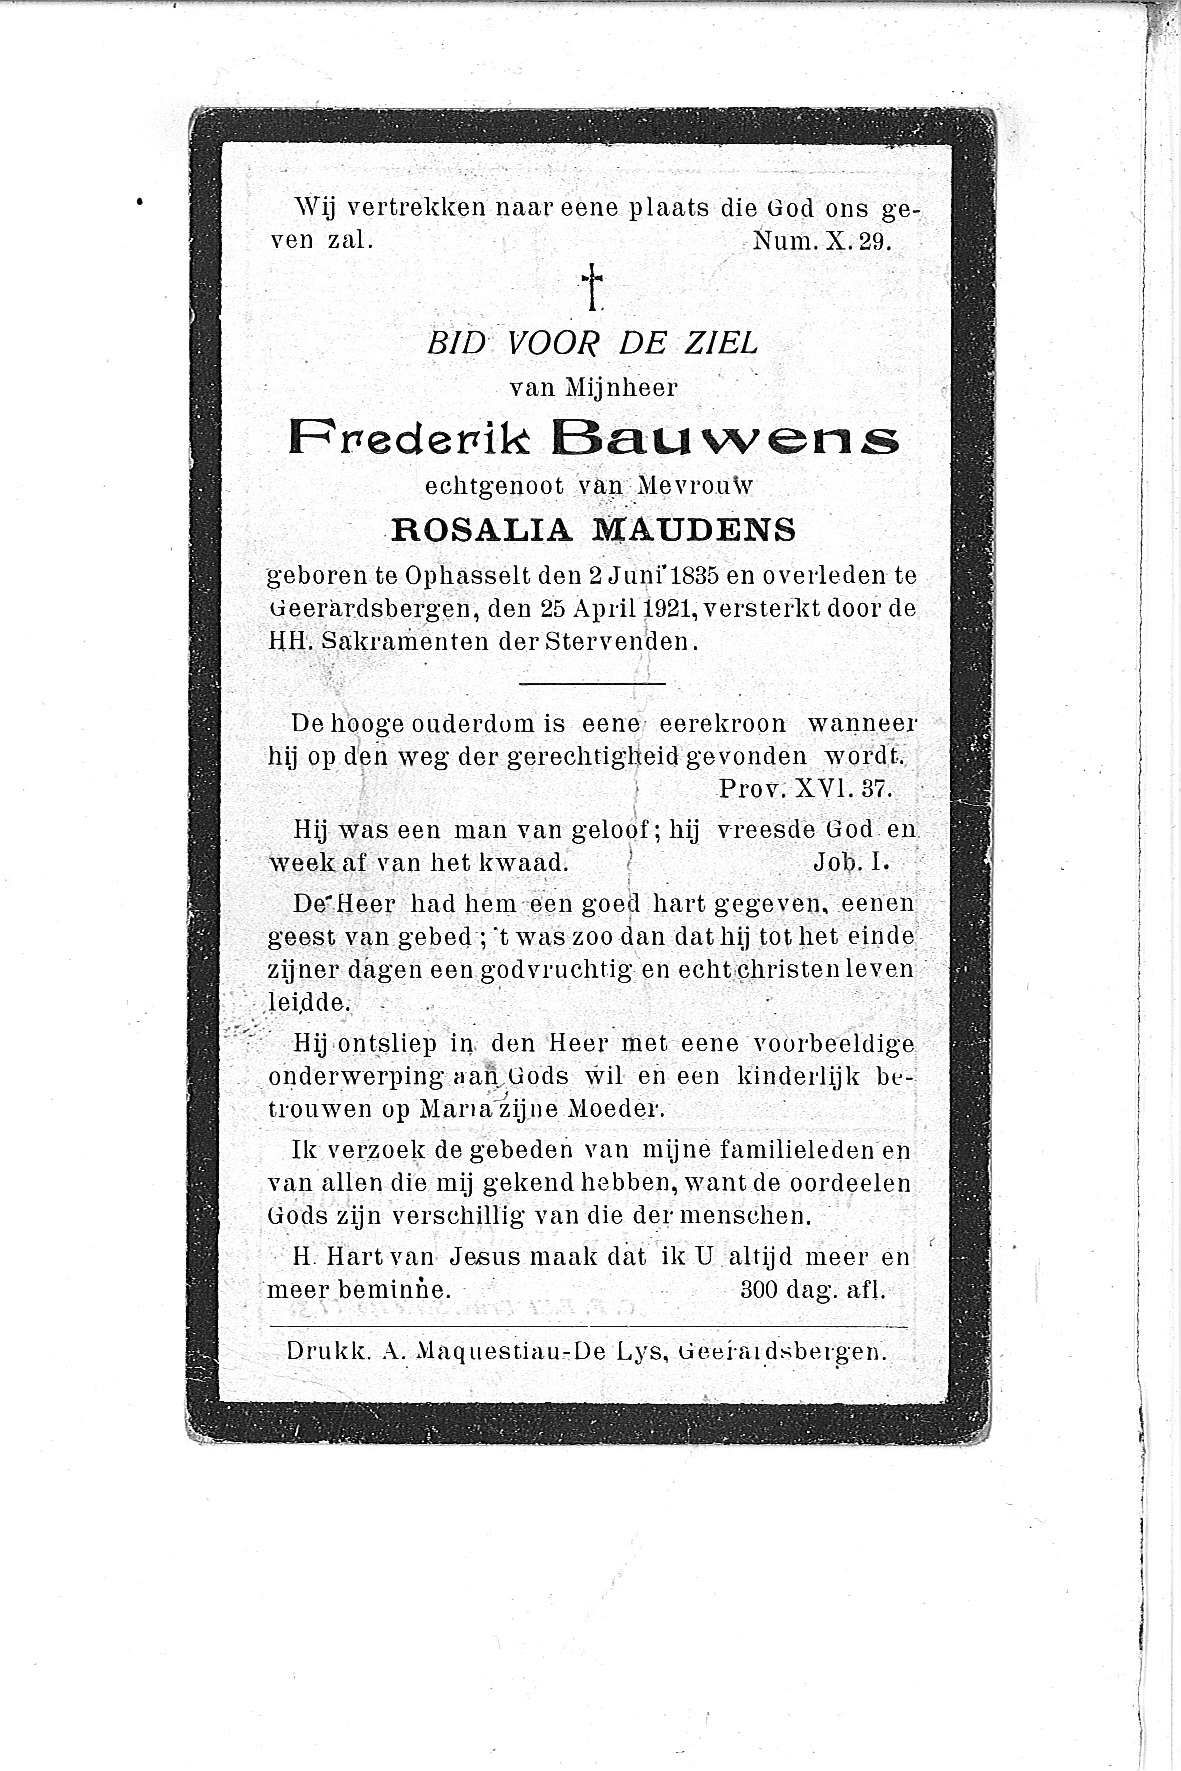 Frederik(1921)20101026135255_00032.jpg